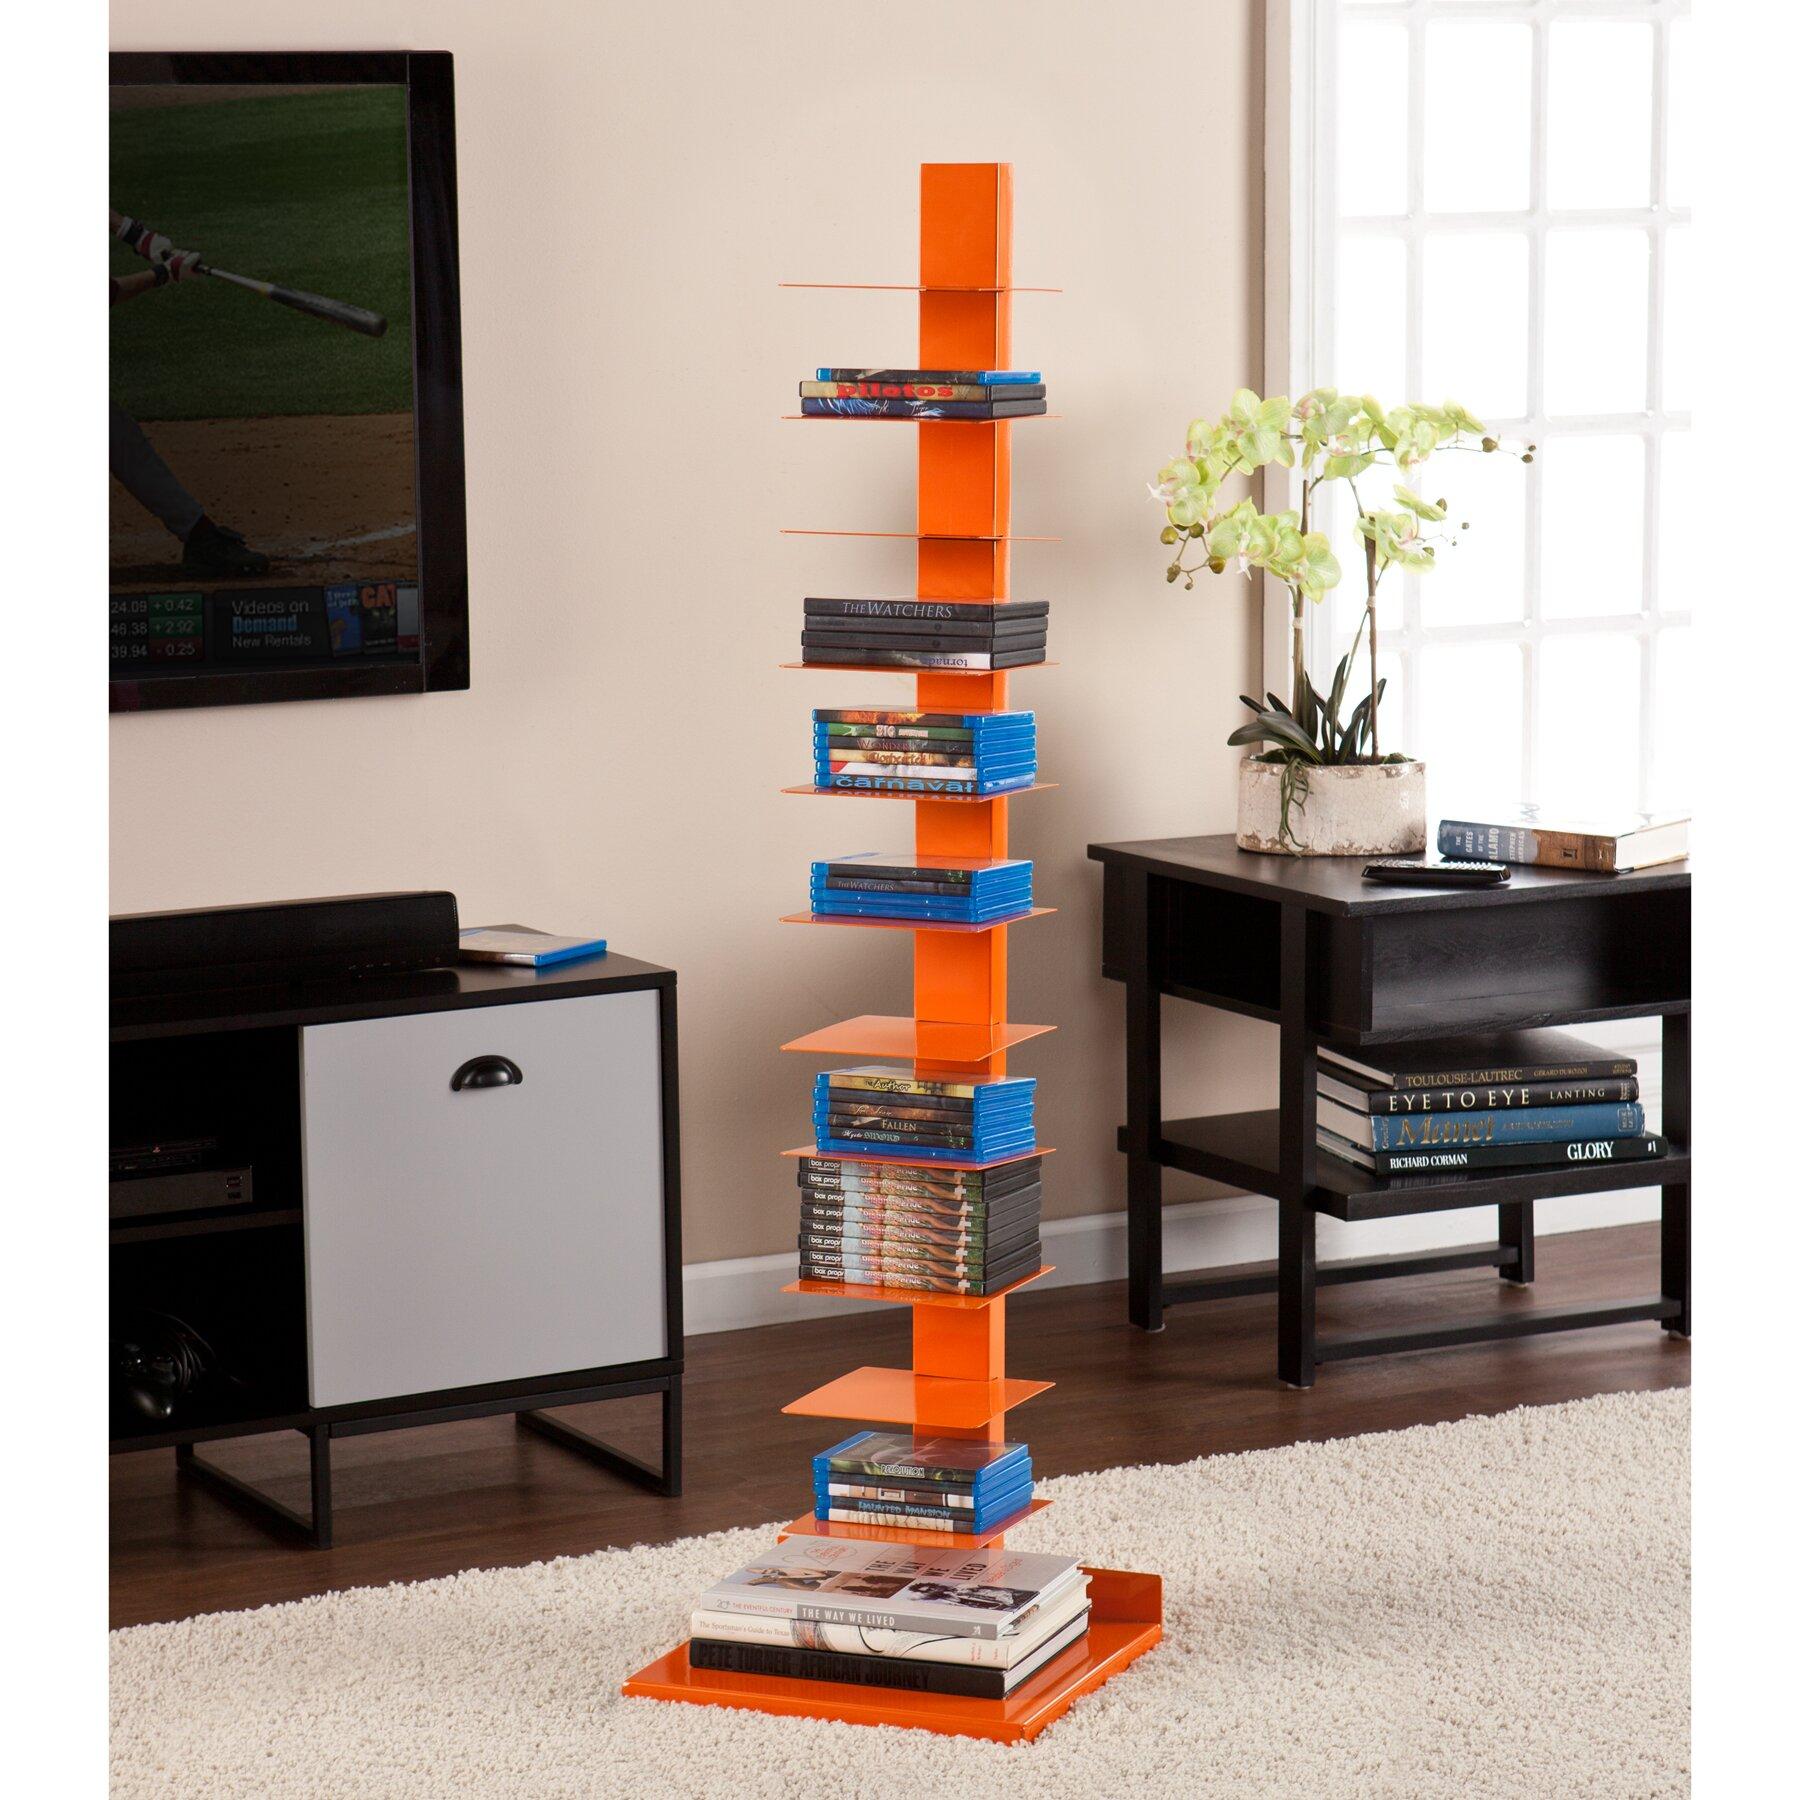 Home etc stoneleigh bookcase reviews wayfair uk for Furniture etc reviews